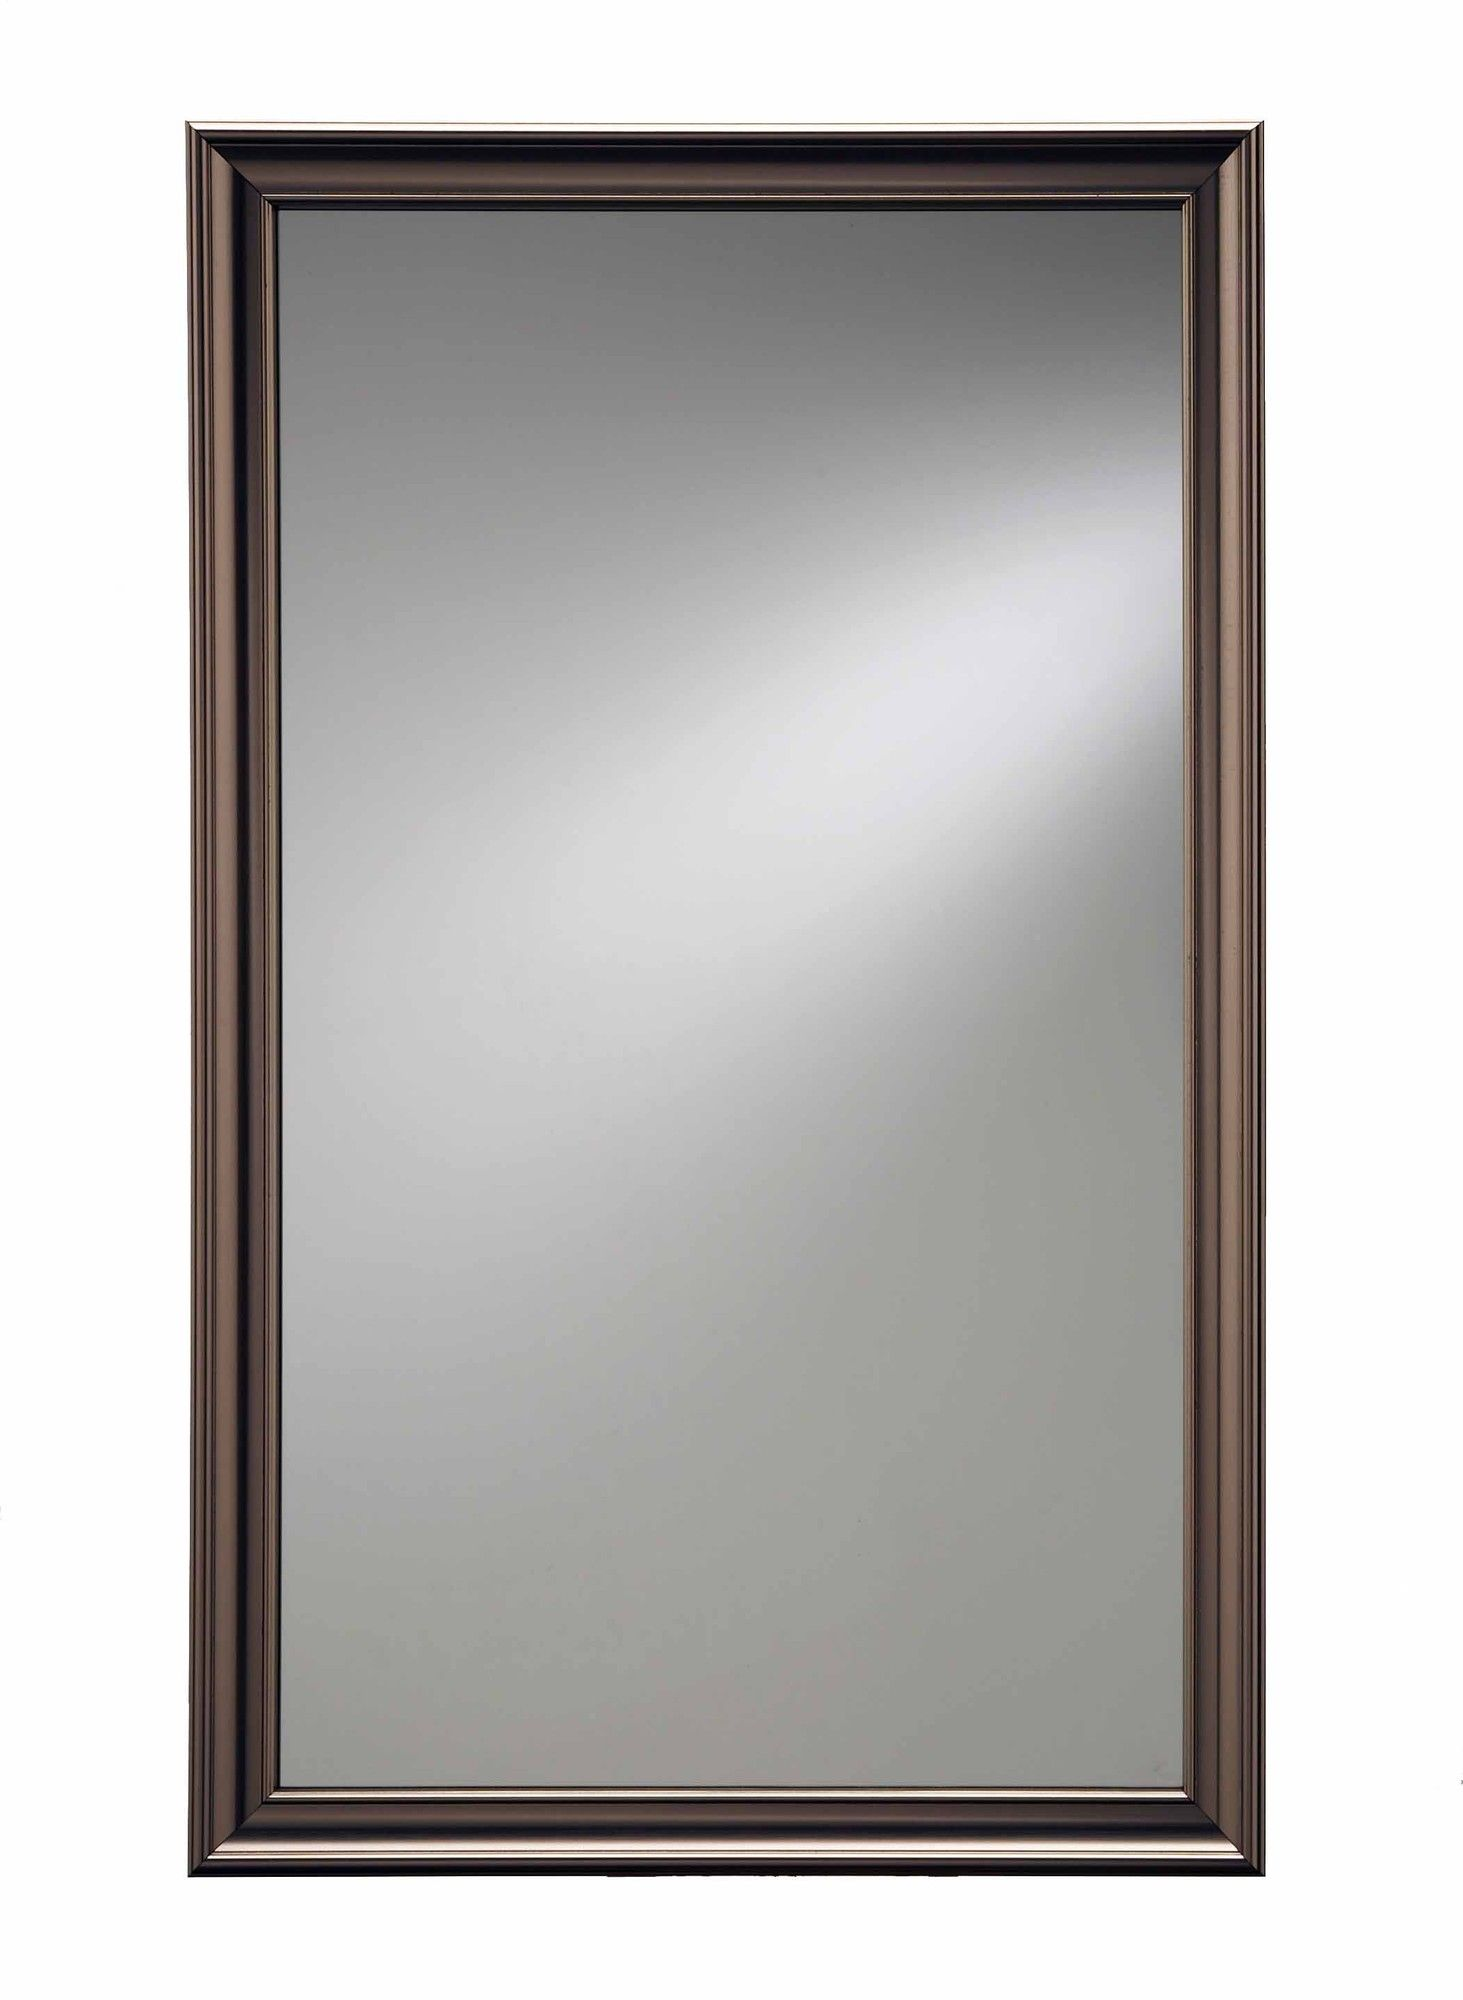 Broan 16 X 26 Recessed Medicine Cabinet Recessed Medicine Cabinet Medicine Cabinet Mirror Adjustable Shelving